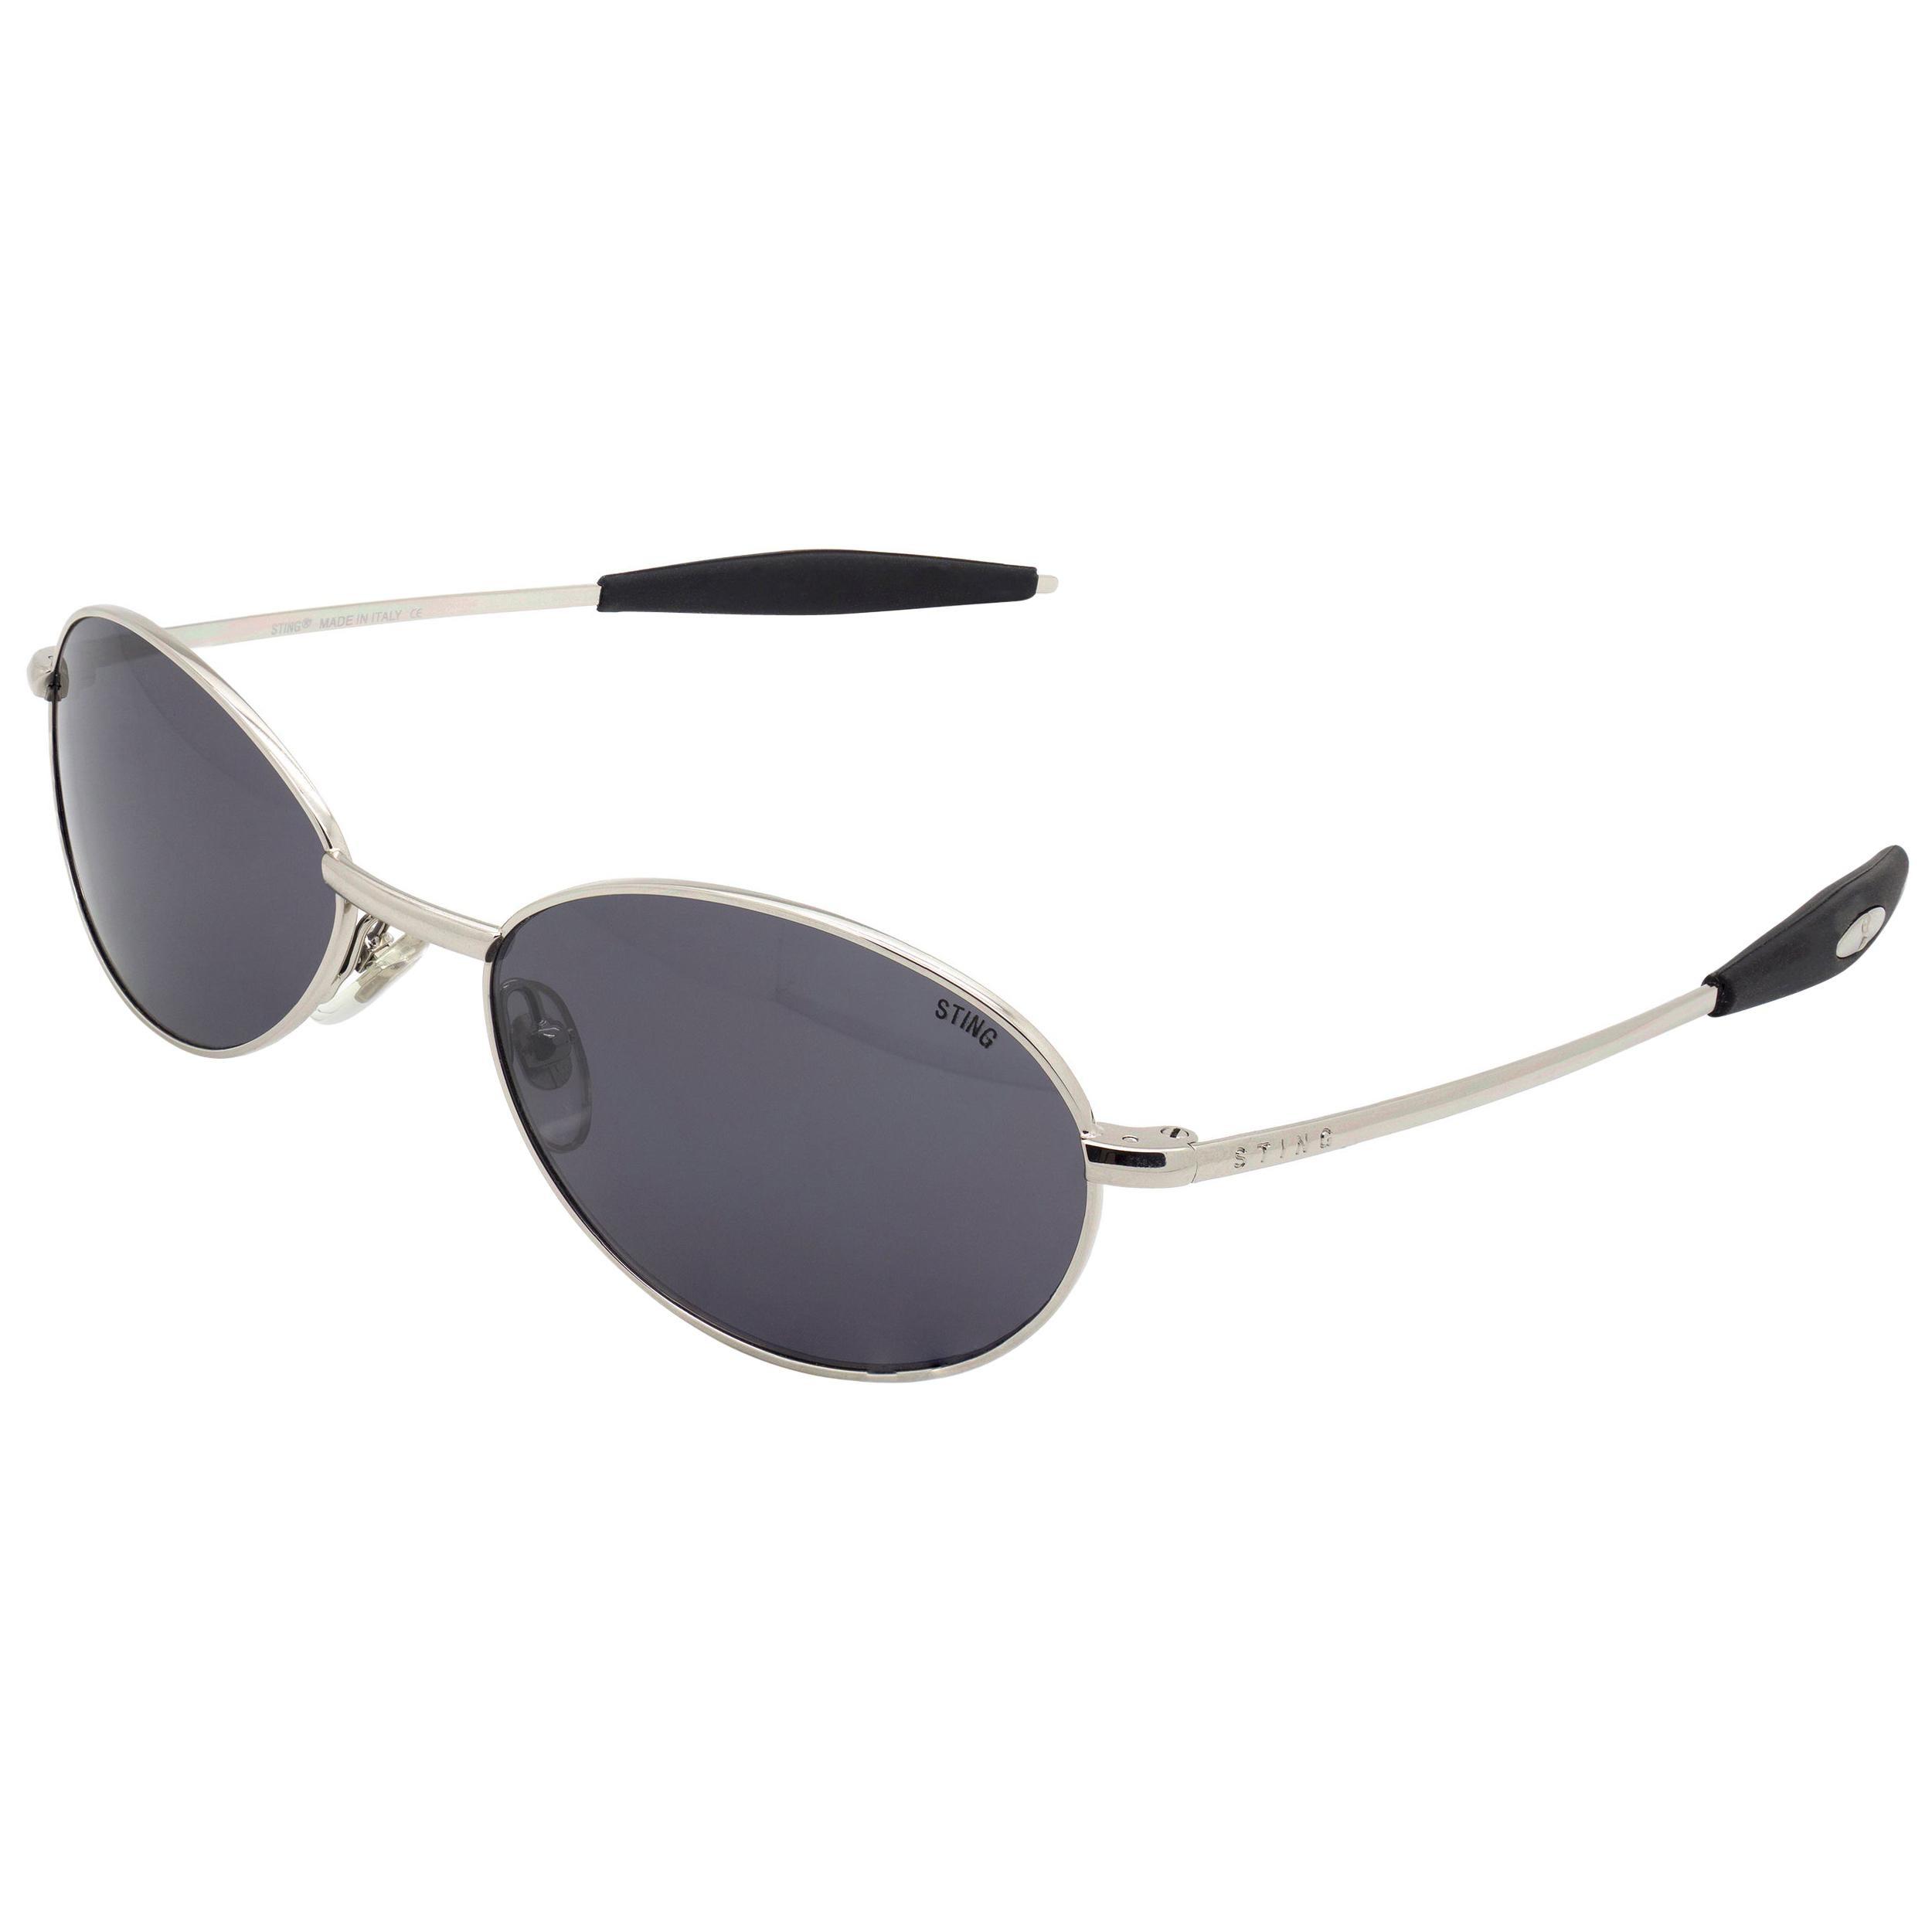 Sting vintage sunglasses wrap, Italy 90s